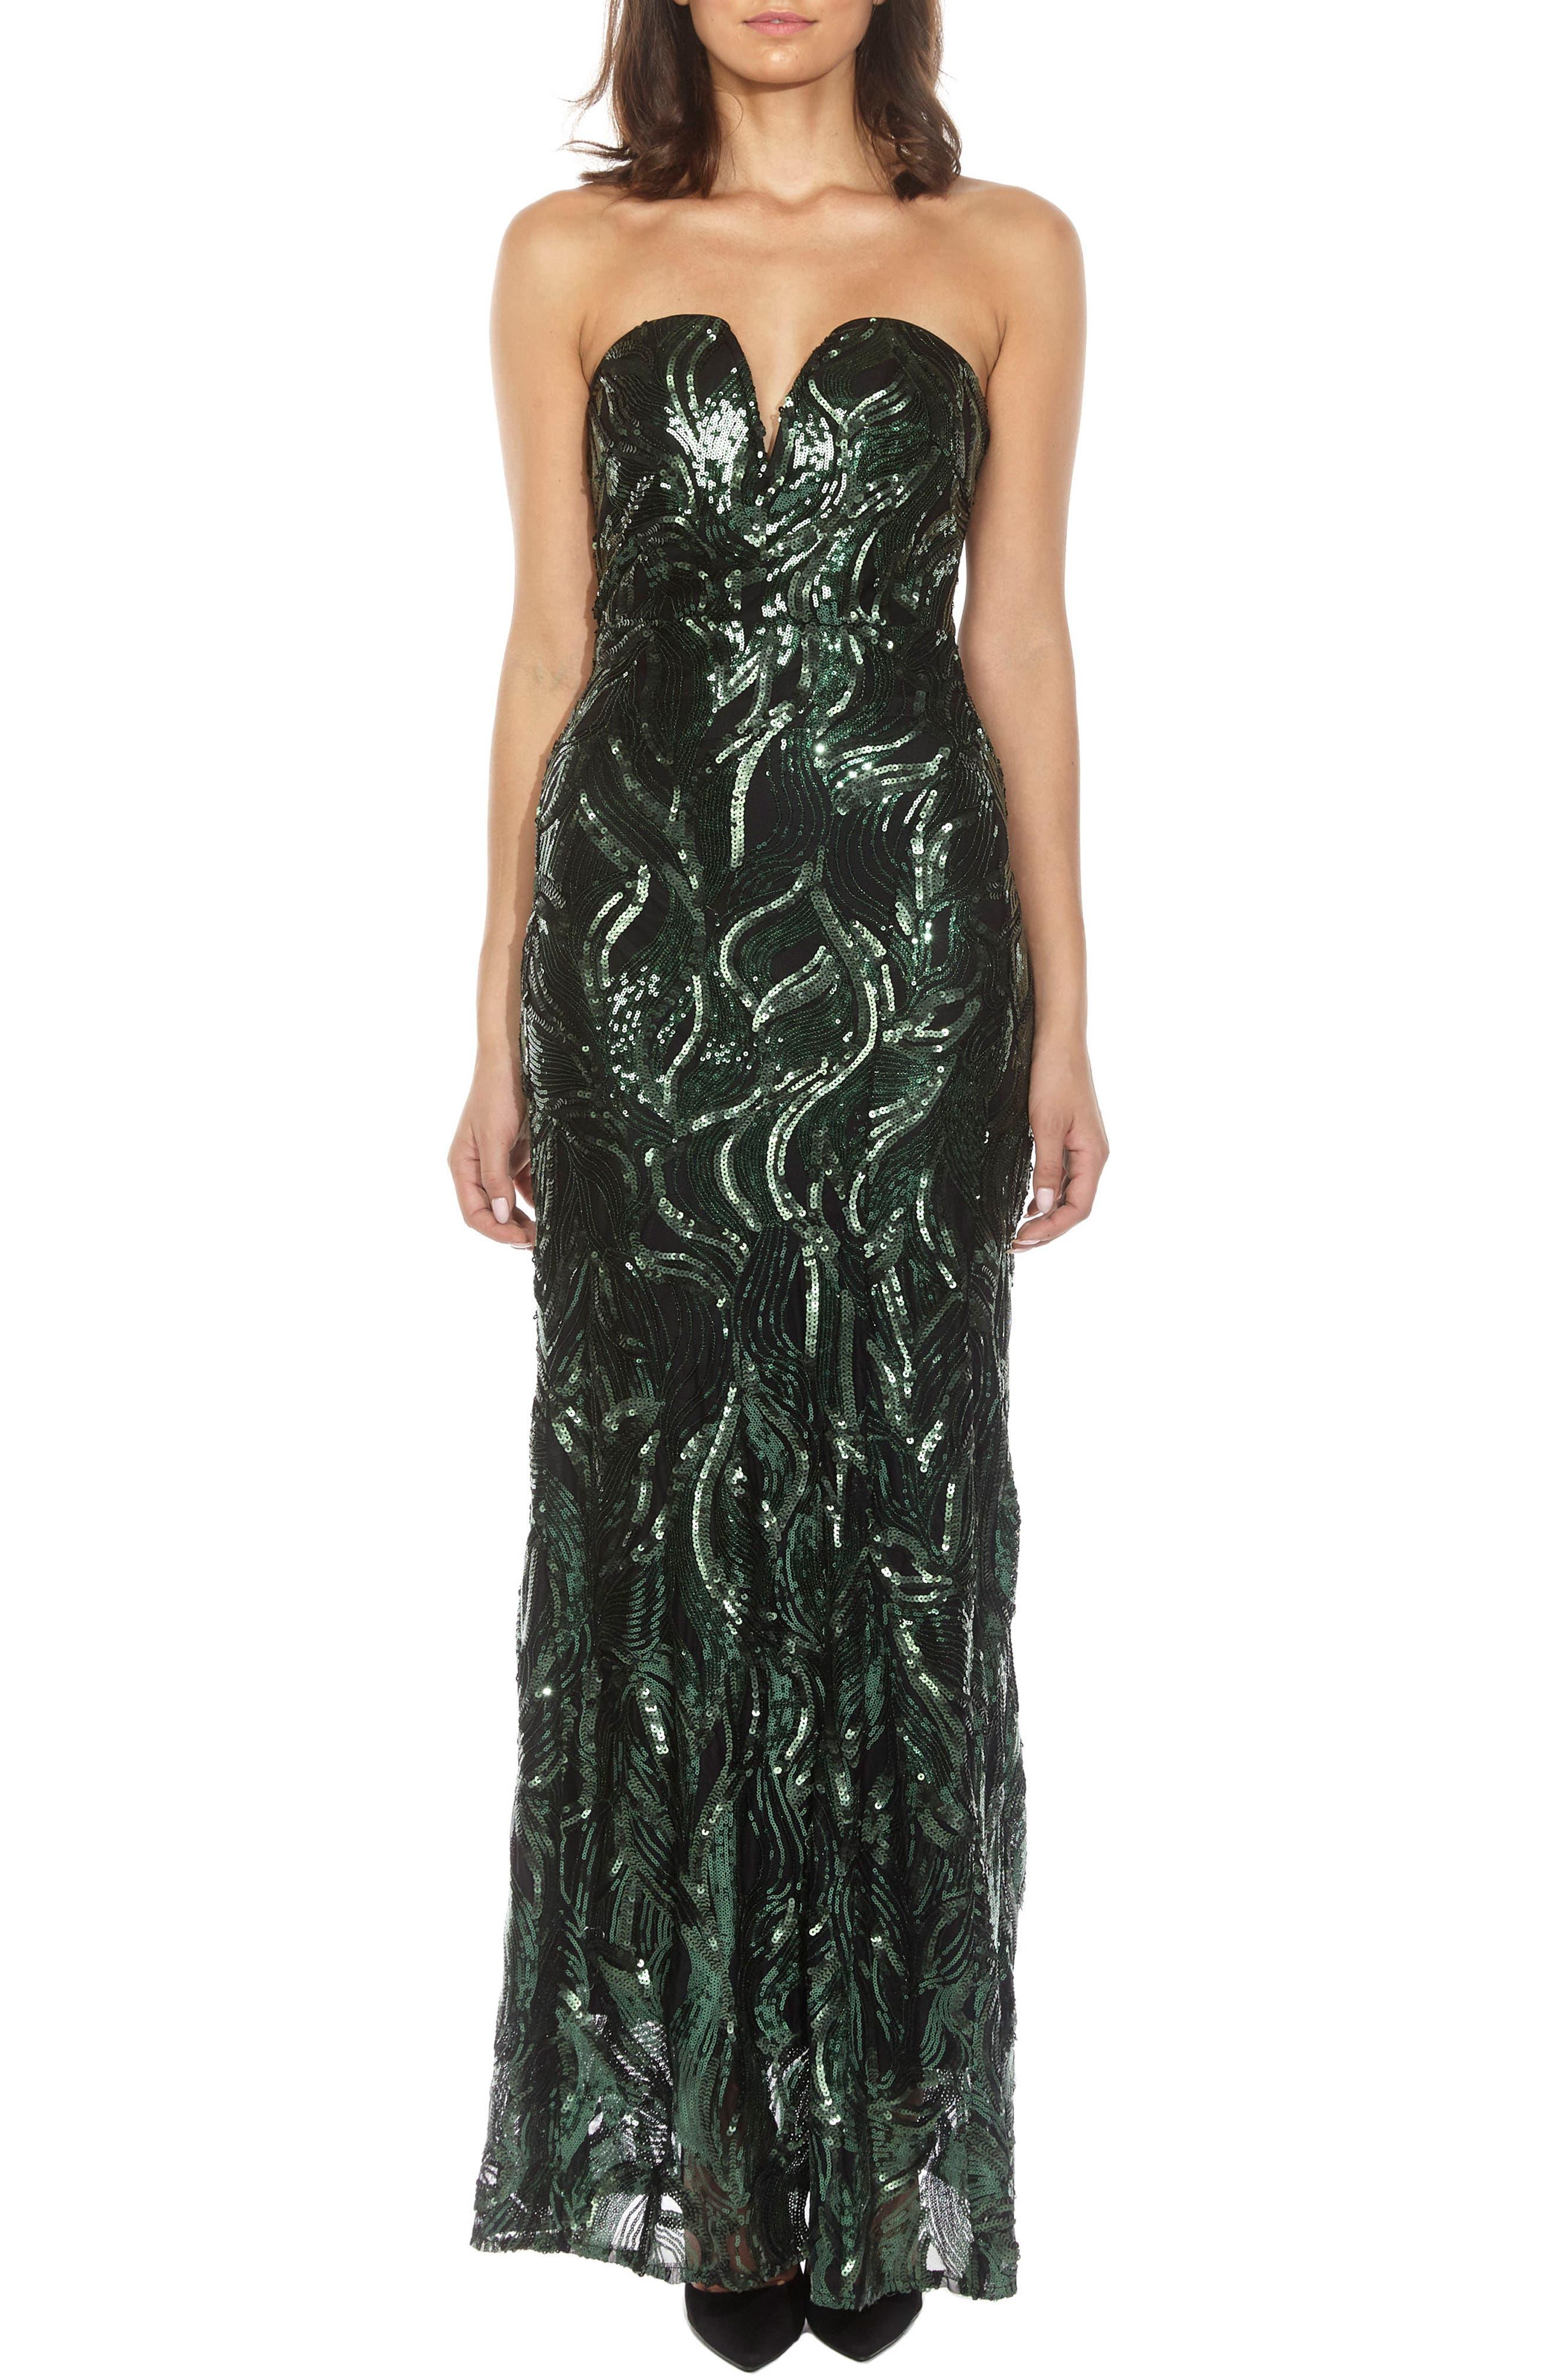 Gaynor Sequin Strapless Maxi Dress,                             Main thumbnail 1, color,                             Green